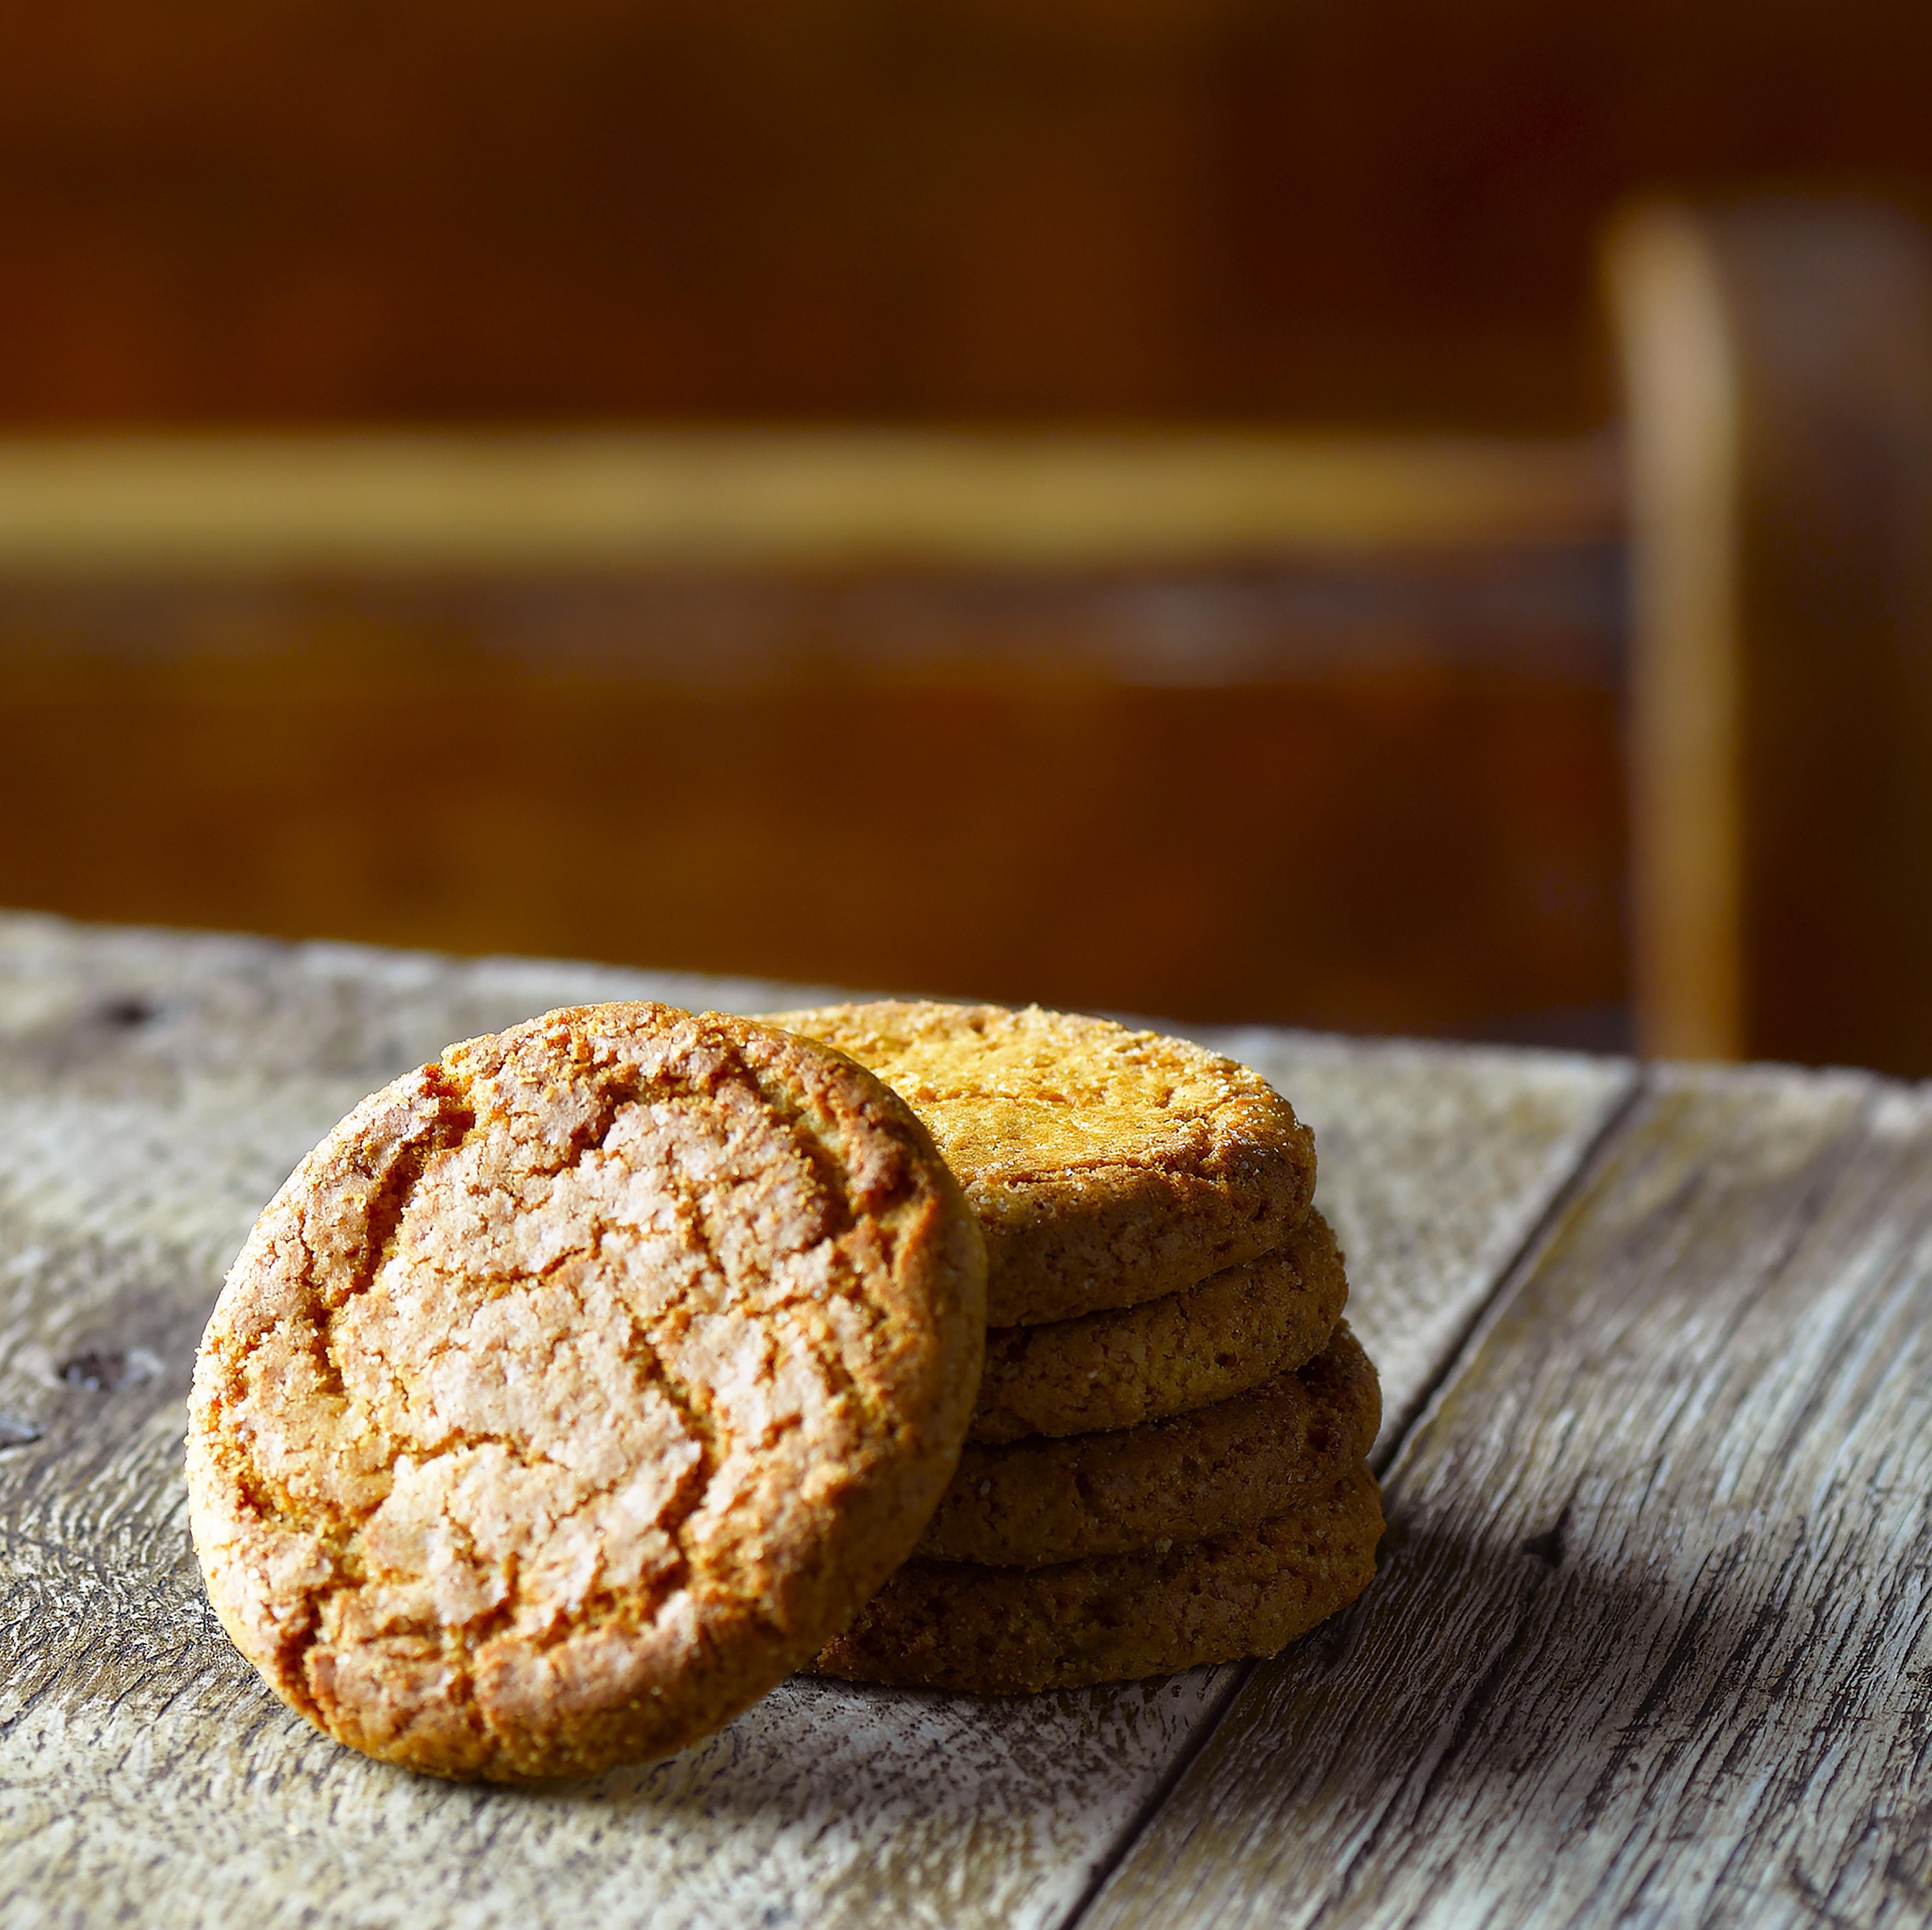 Ginger biscuits (aka ginger snaps)